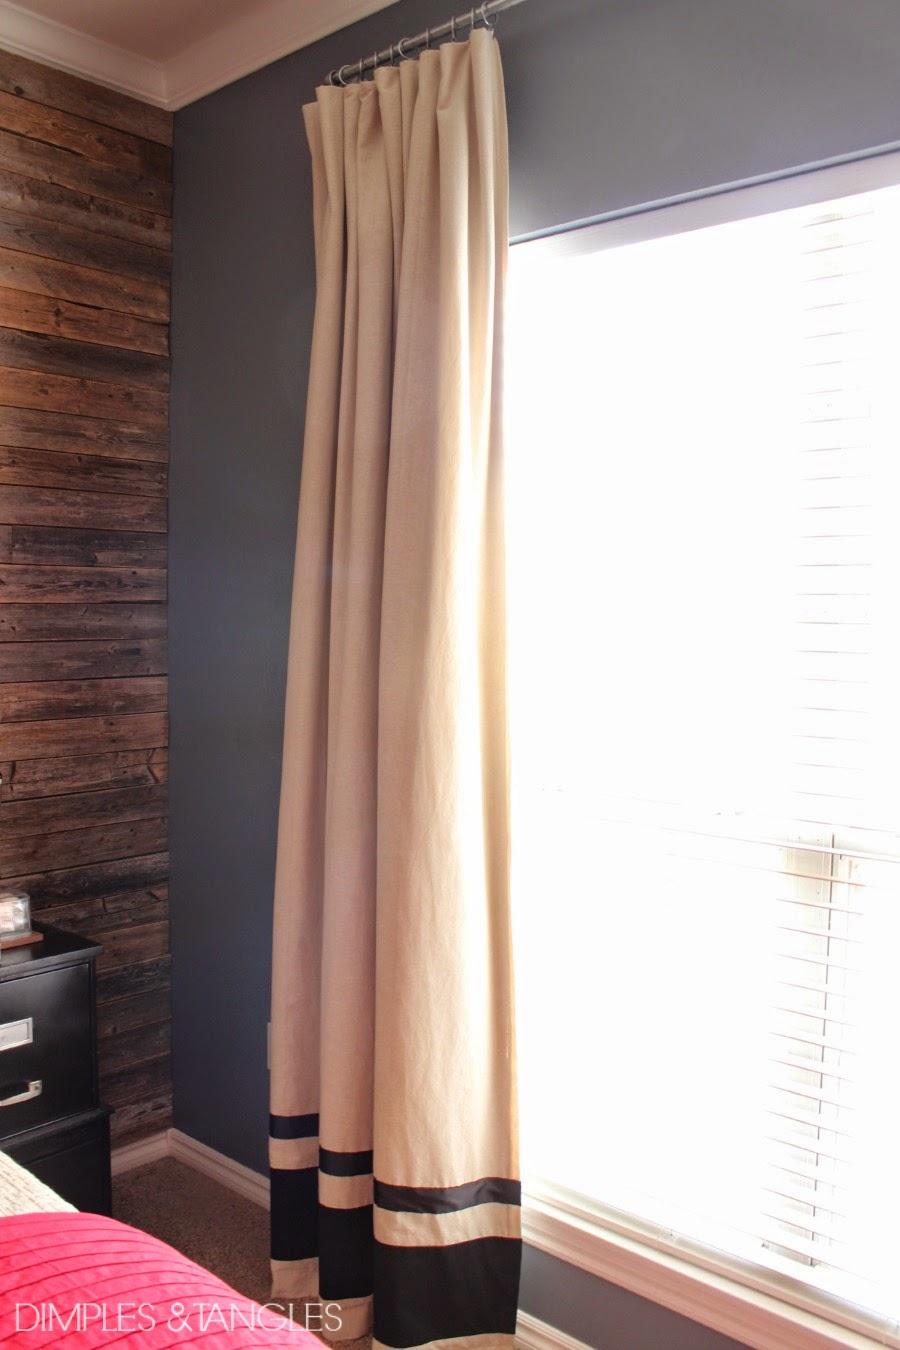 Customizing Ikea Curtains And A Diy Industrial Curtain Rod